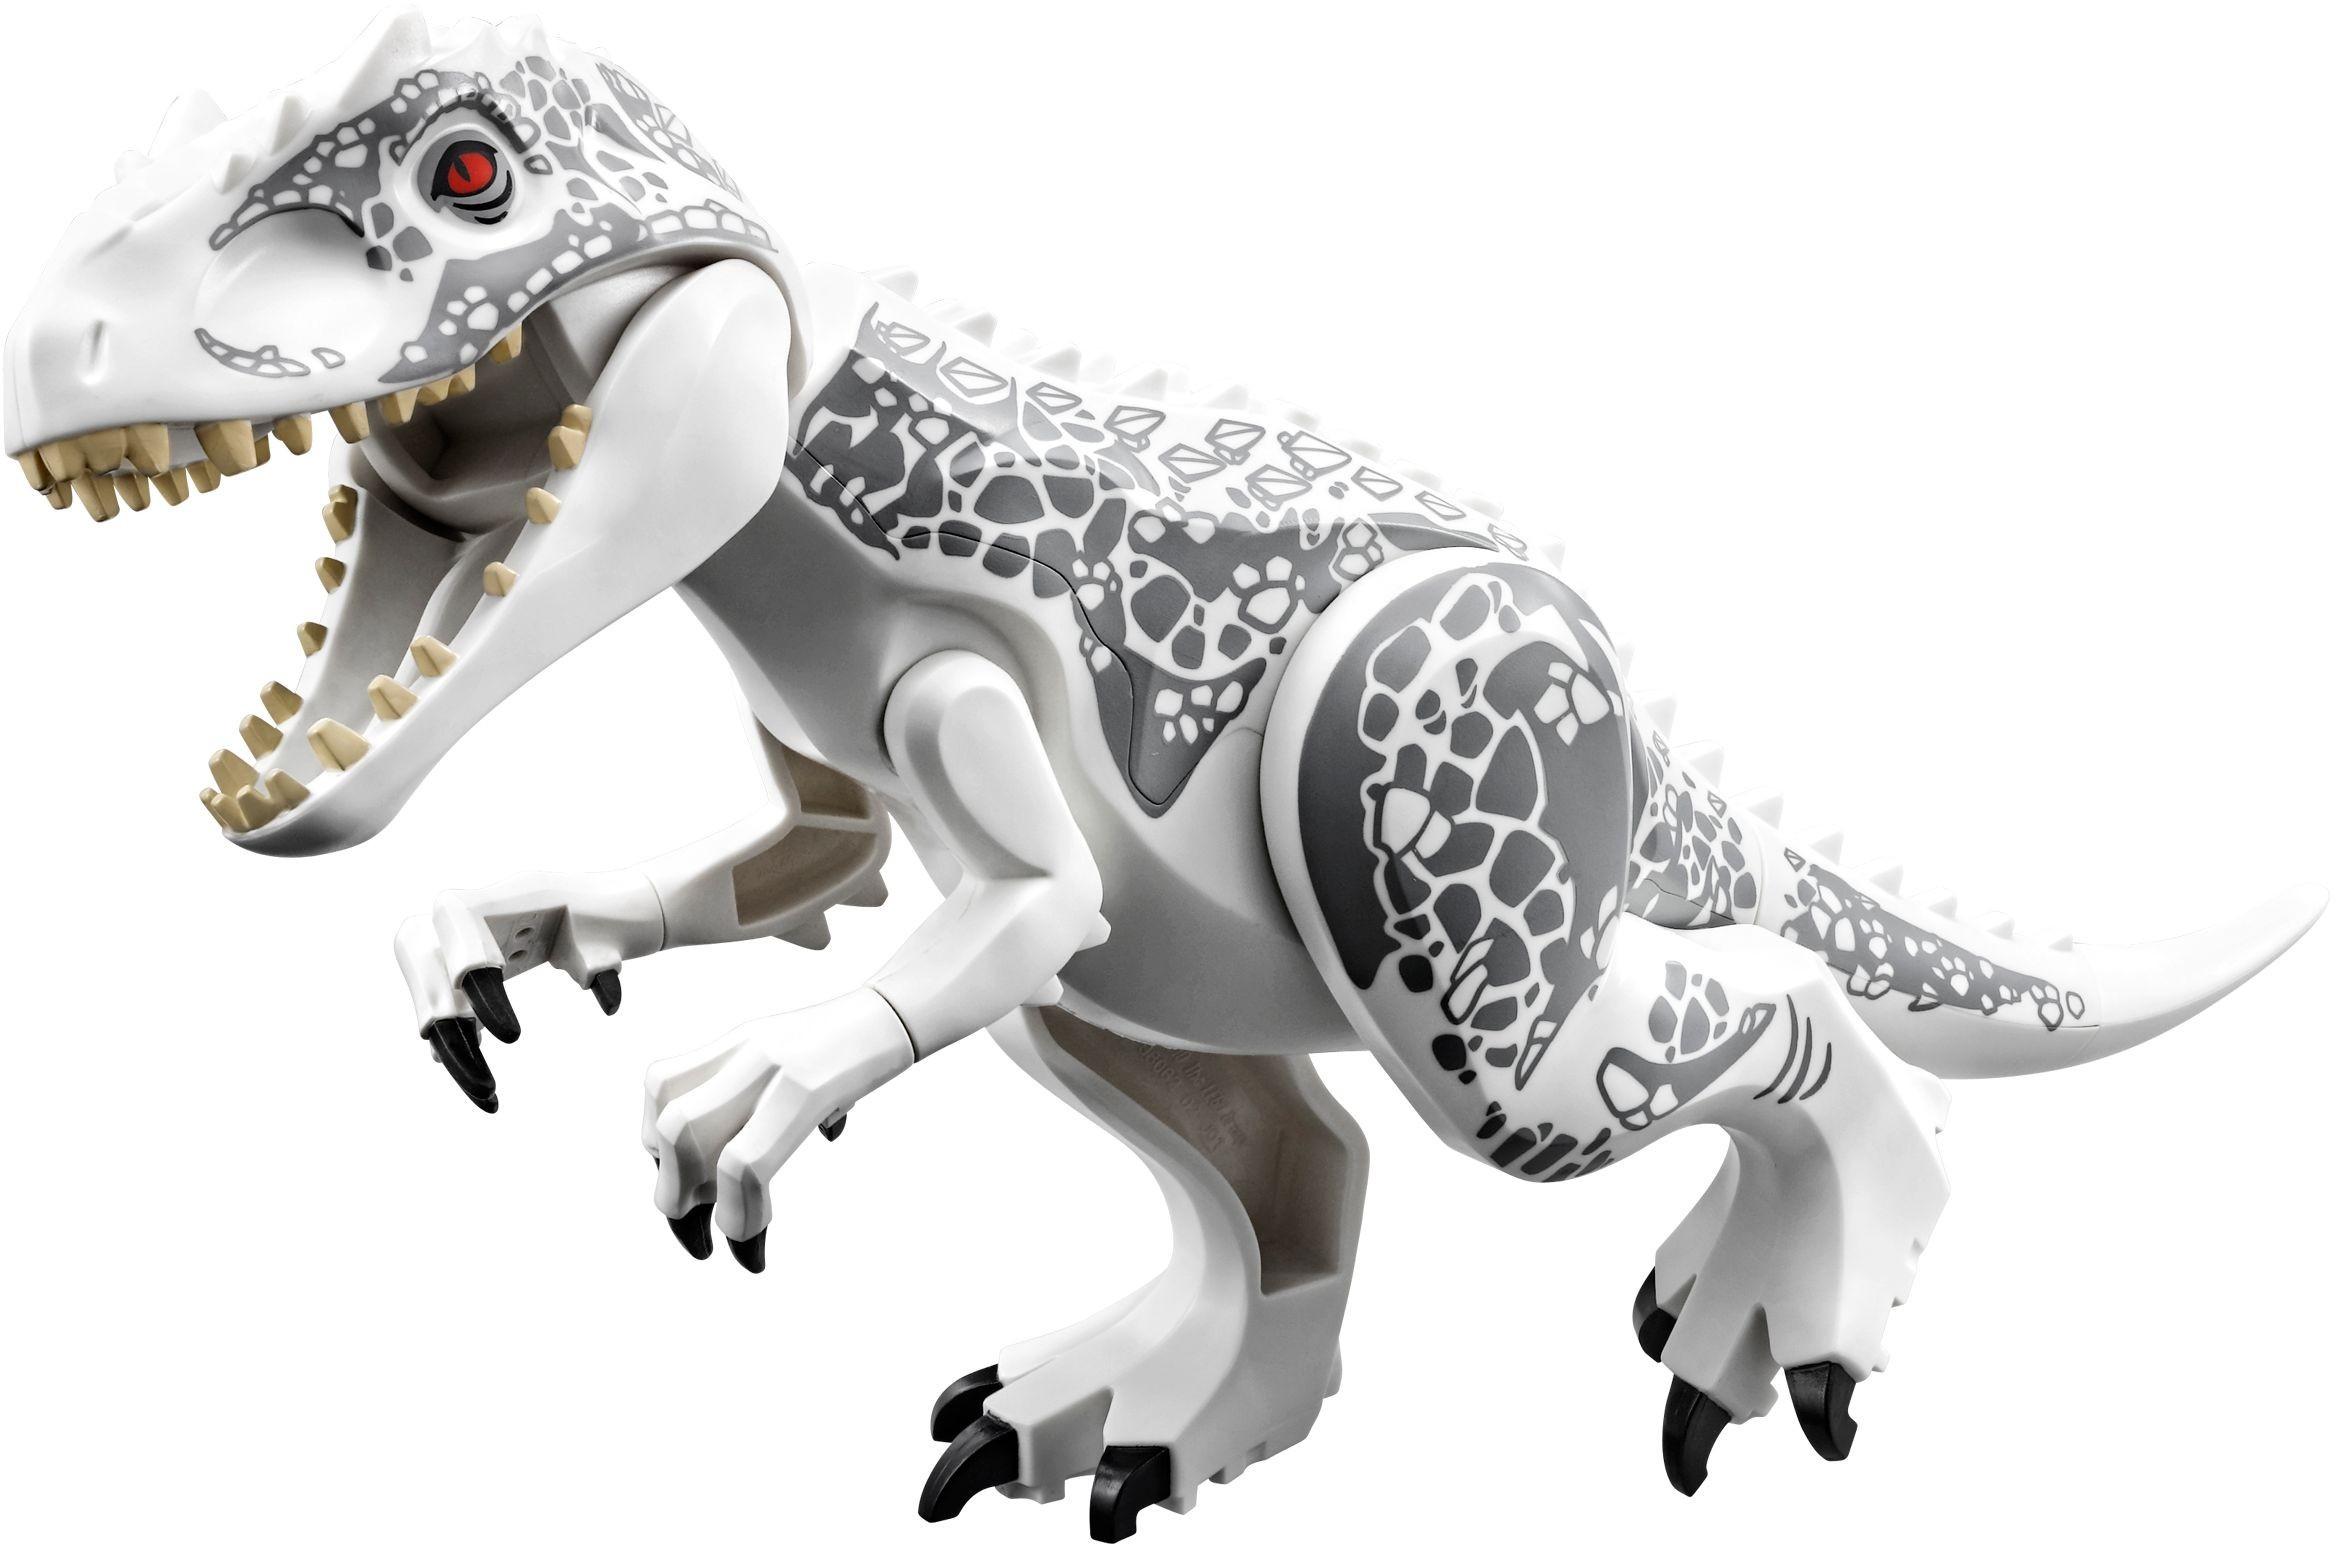 Jurassic World Indominus Rex Breakout In Stock